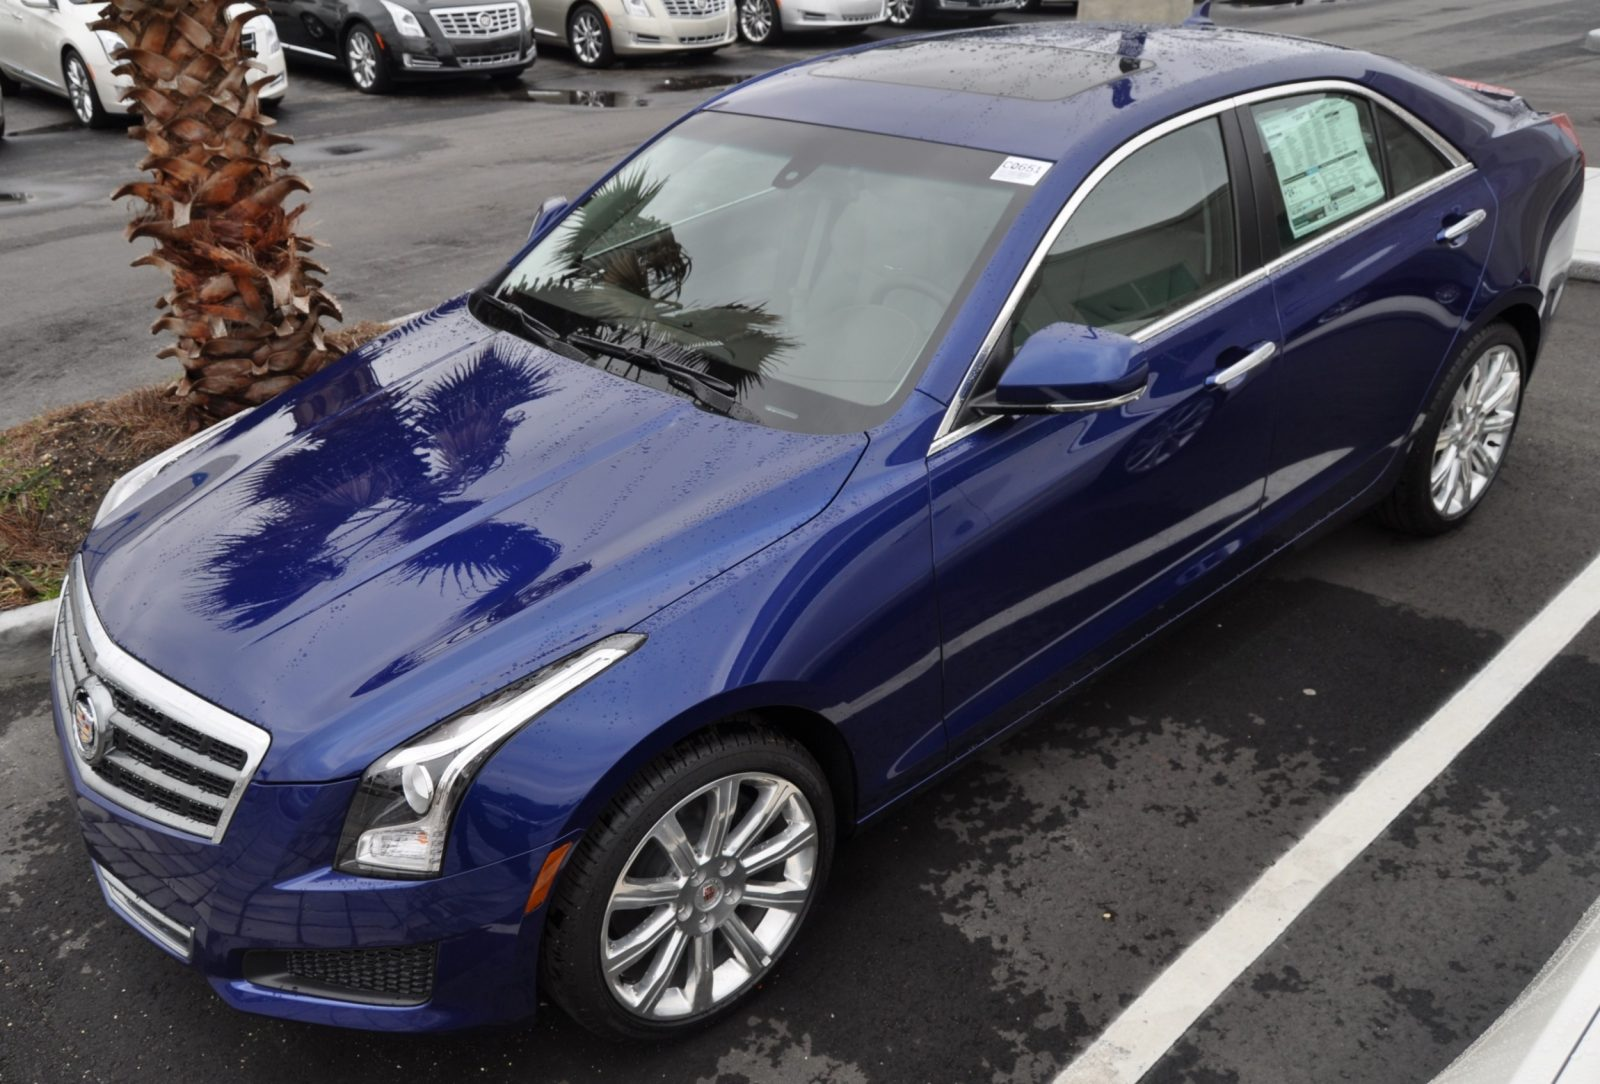 2014 Cadillac ATS4 - High-Res Photos 11